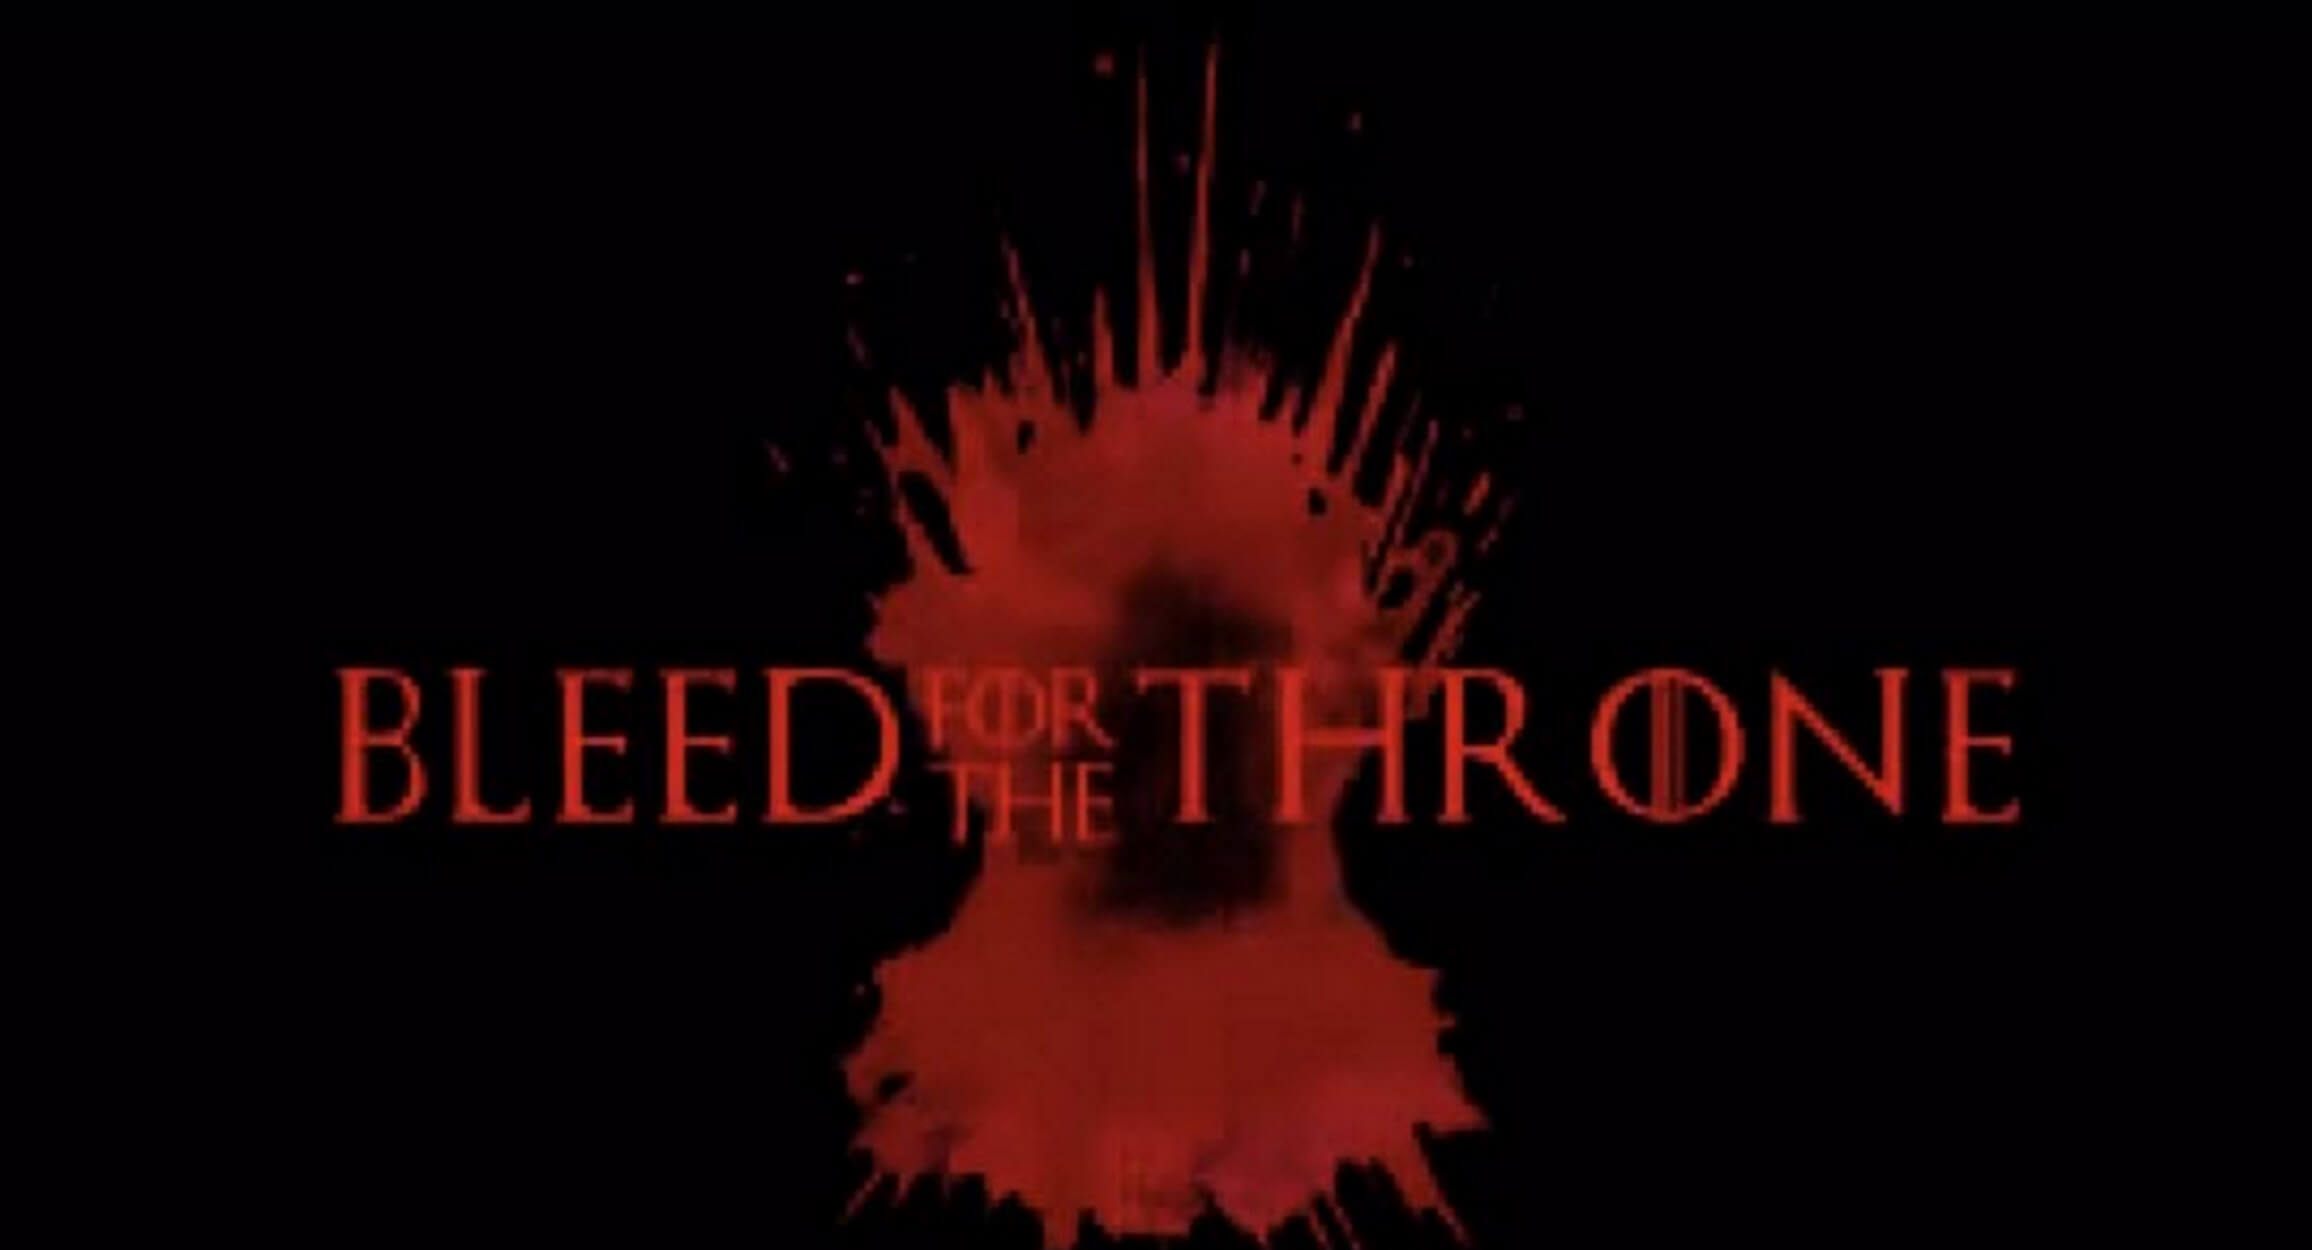 """Game of Thrones"": Διεθνής δράση για εθελοντική αιμοδοσία | Newsit.gr"